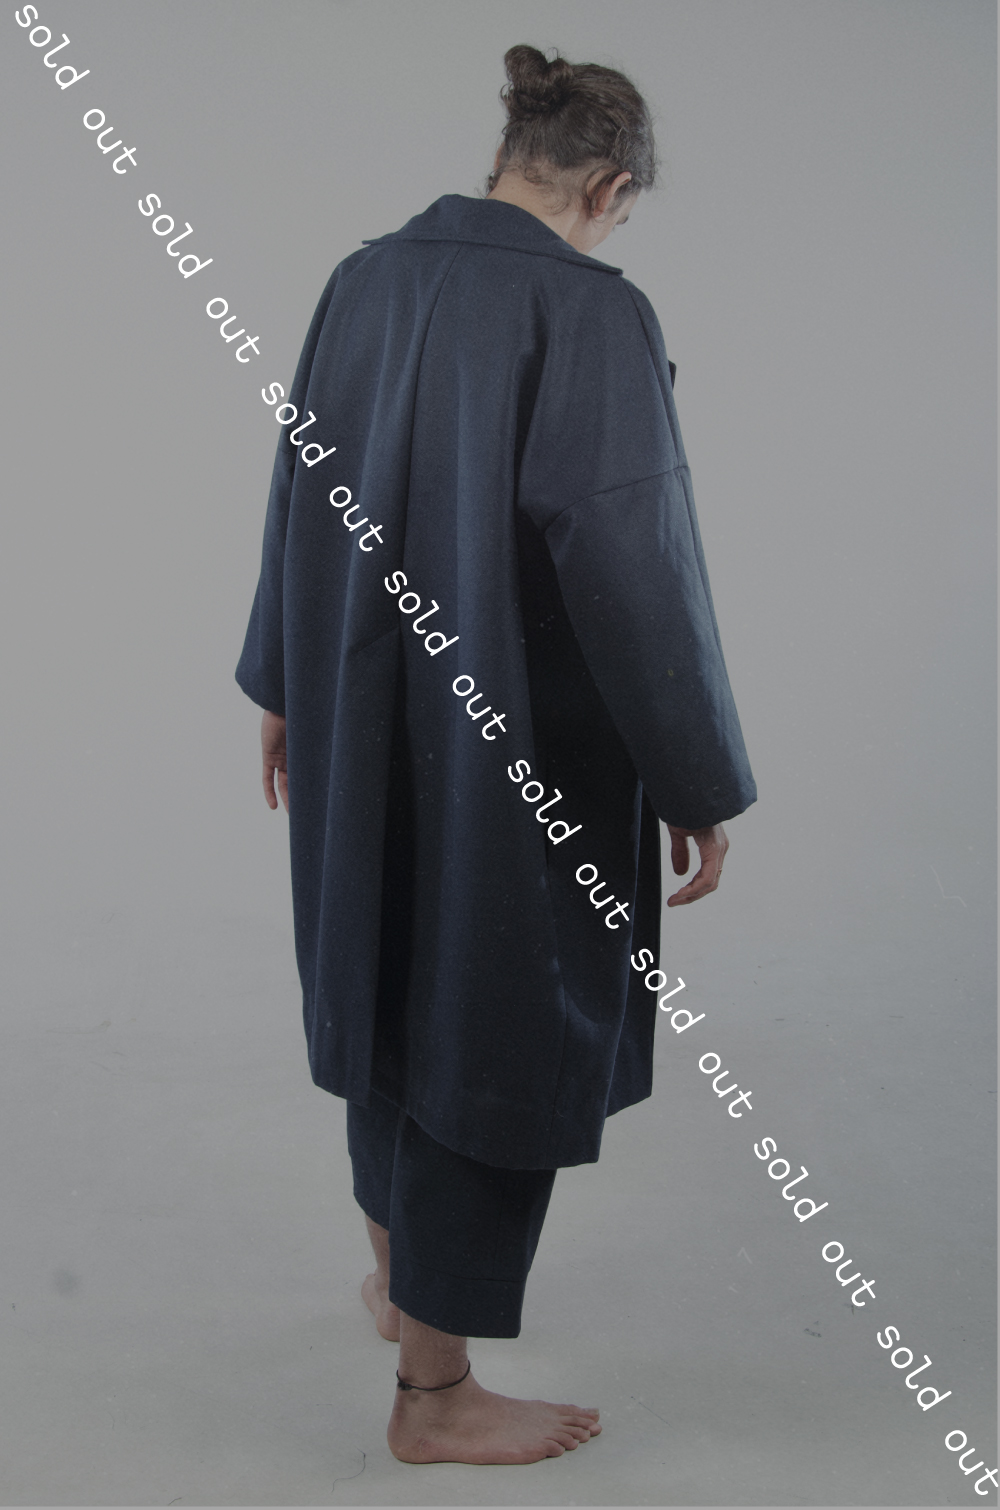 joseph-hollebon-kimono-coat-agoraphobia